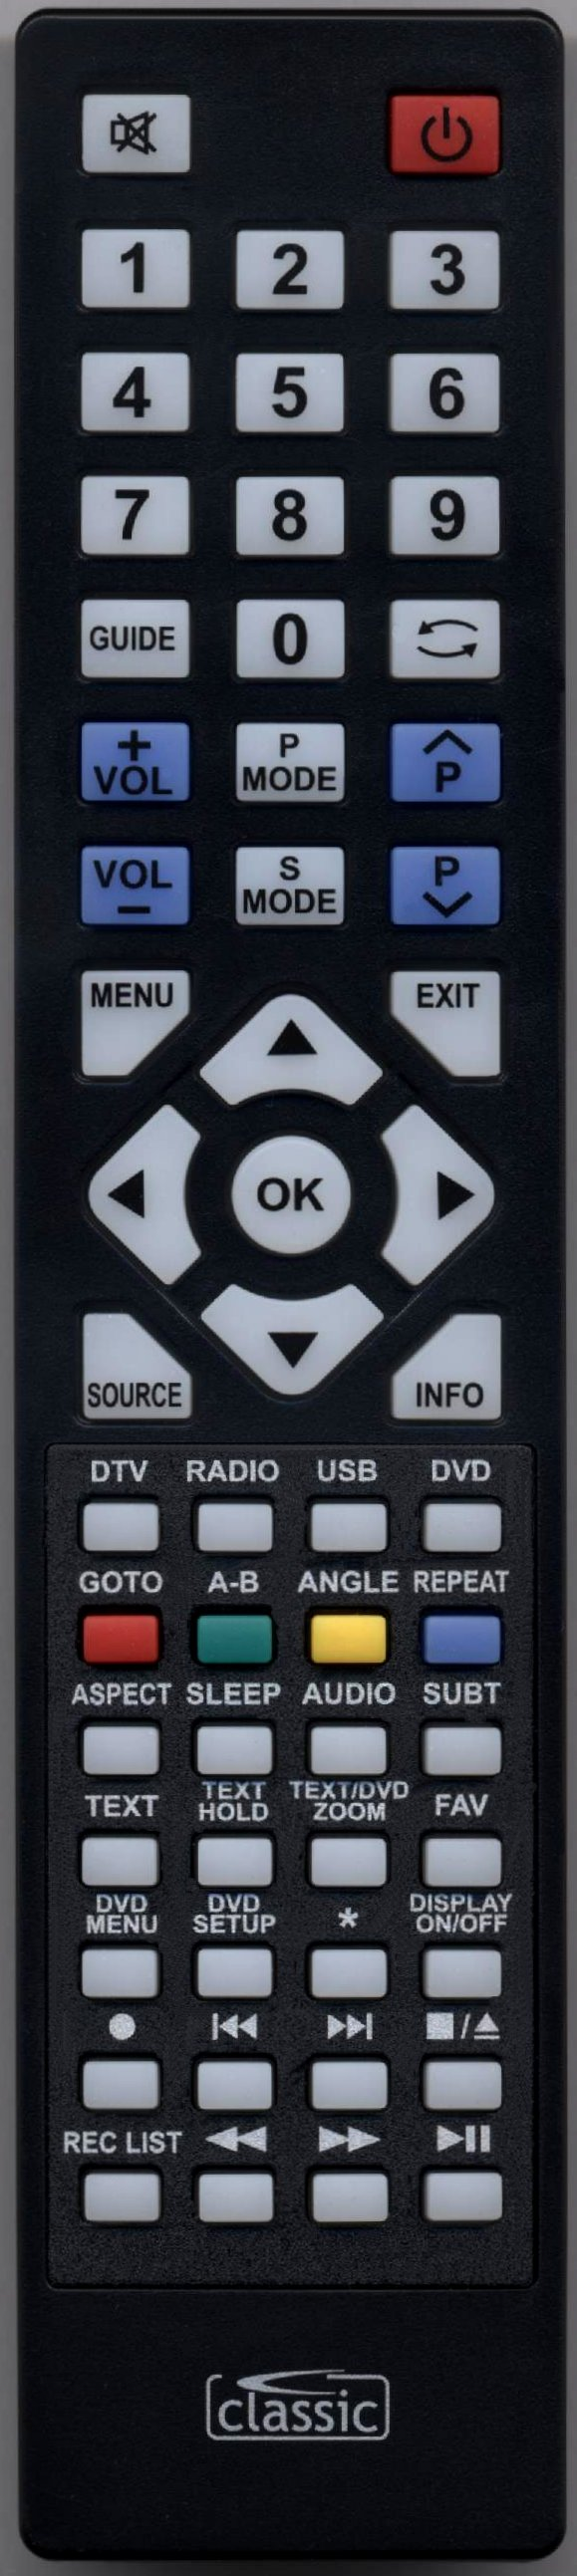 BLAUPUNKT 19-207DVD Remote Control